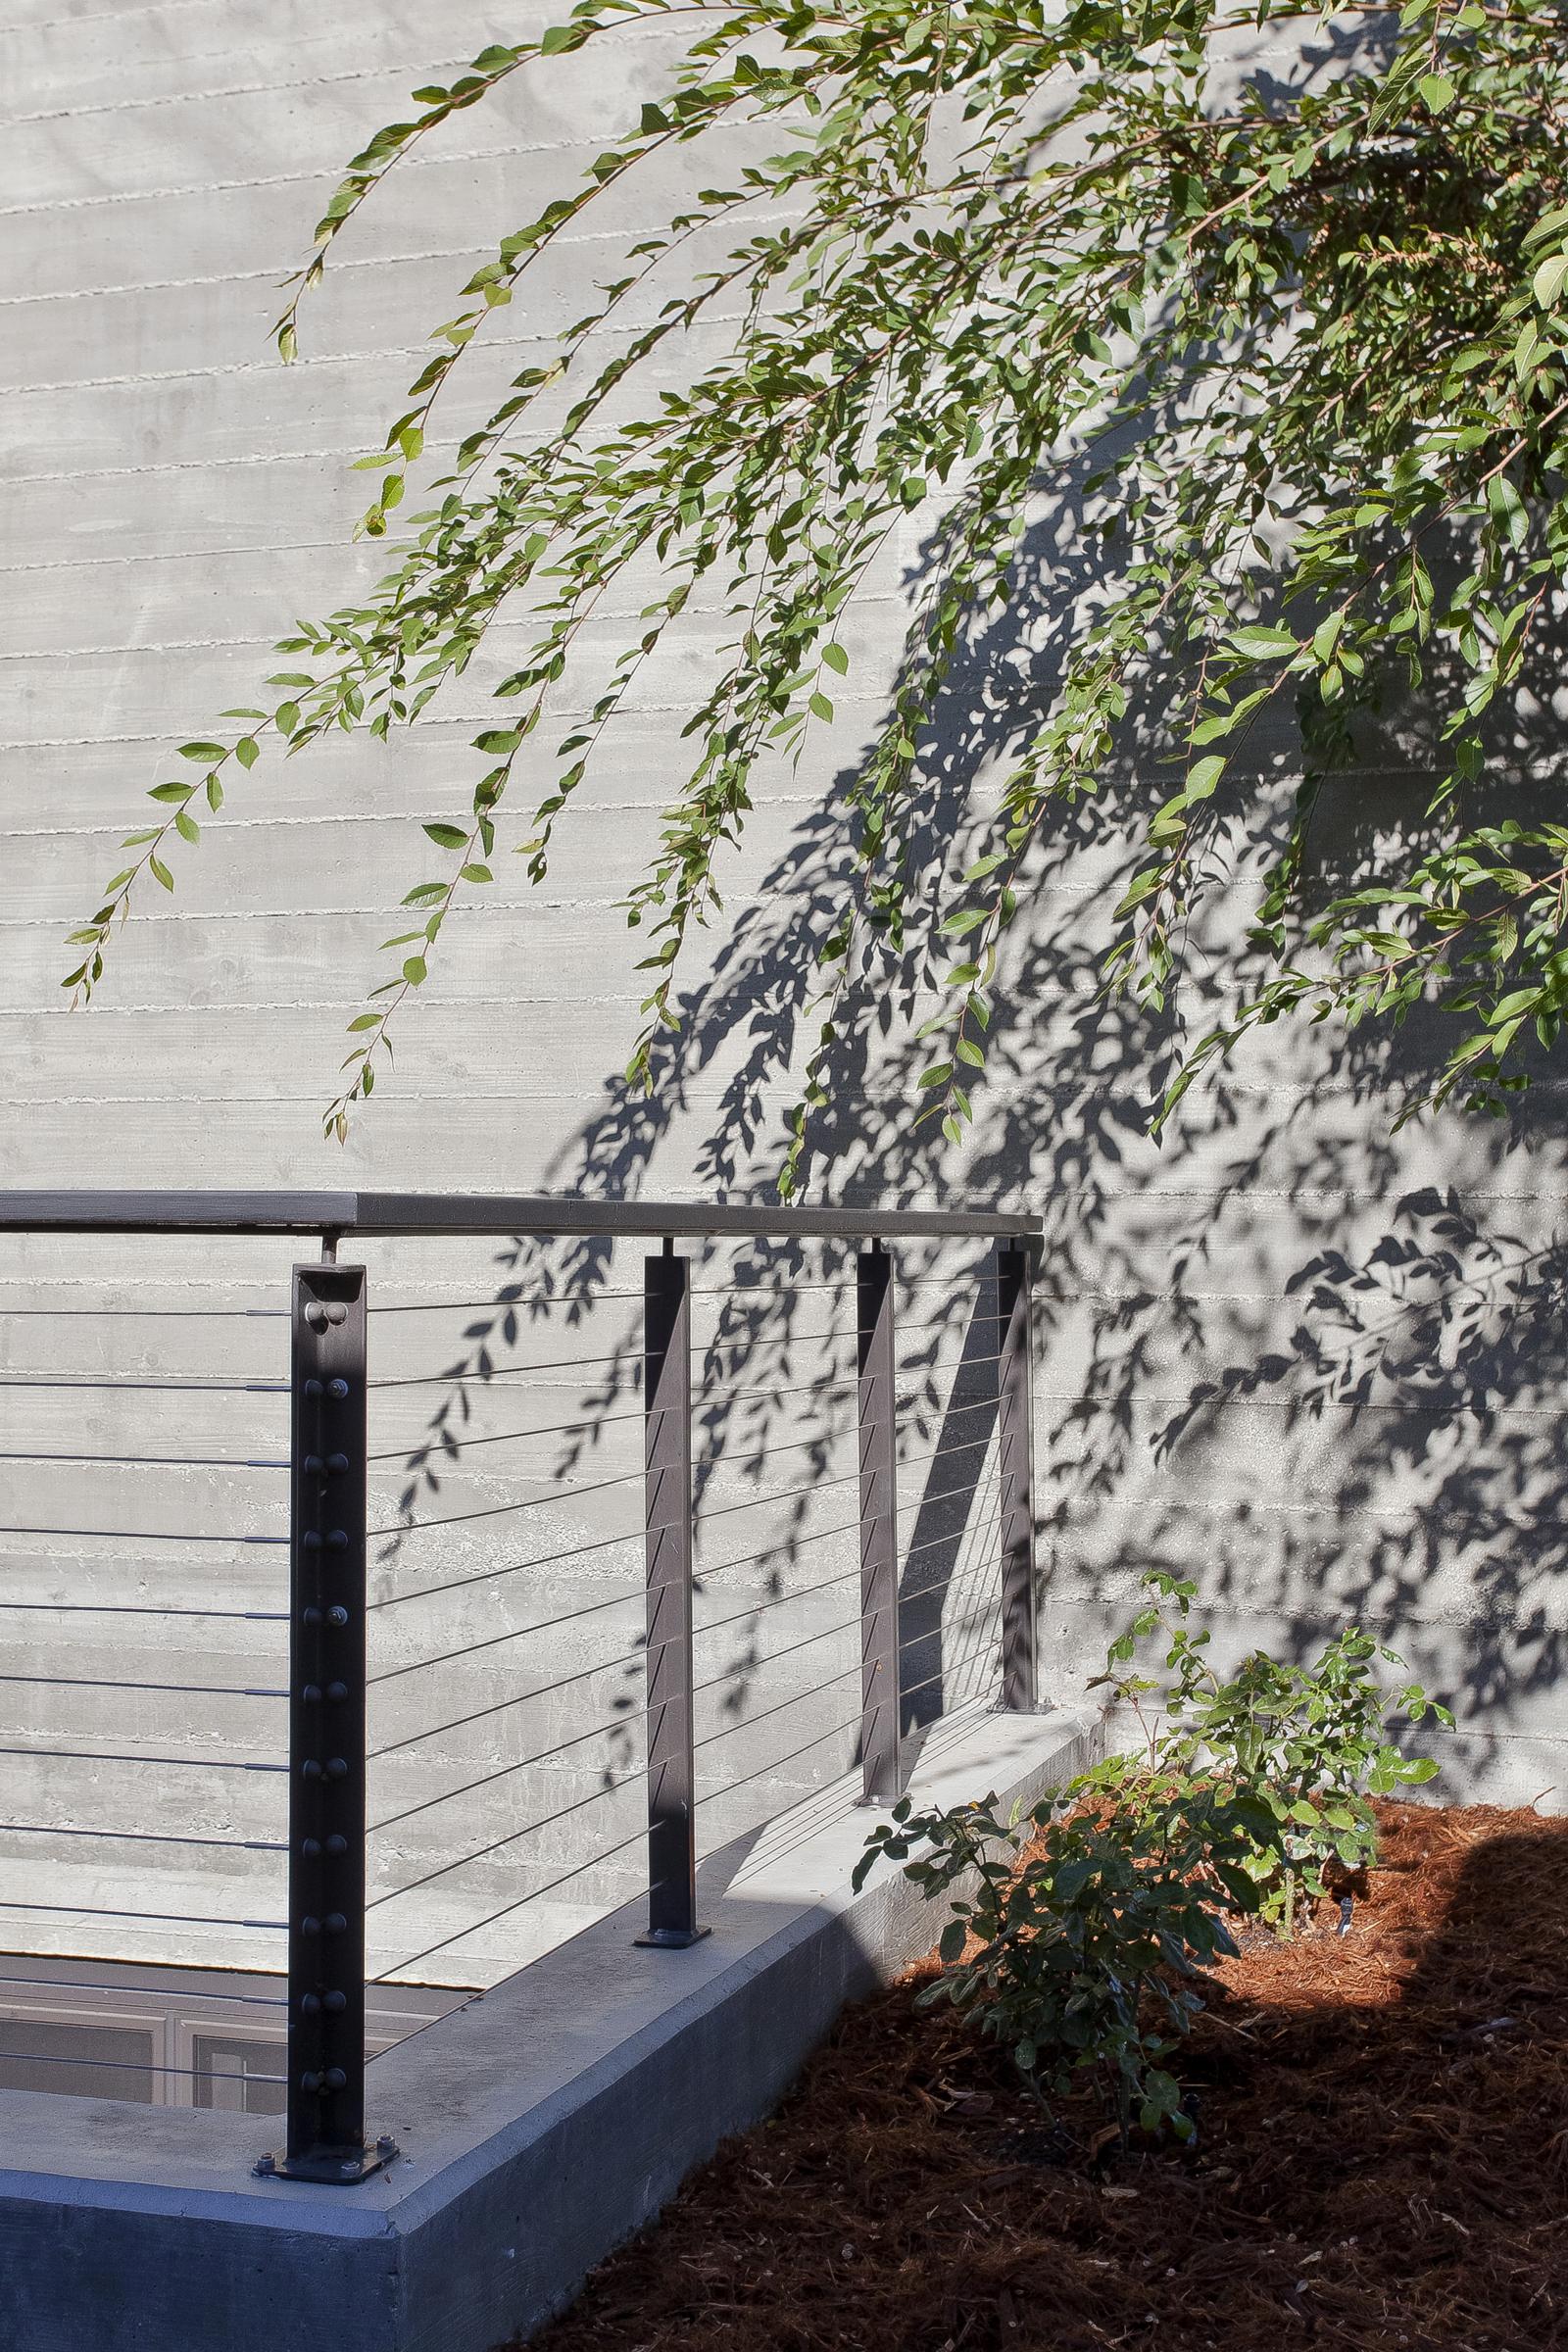 28-471 S. Clark Tree Railing & Concrete.jpg